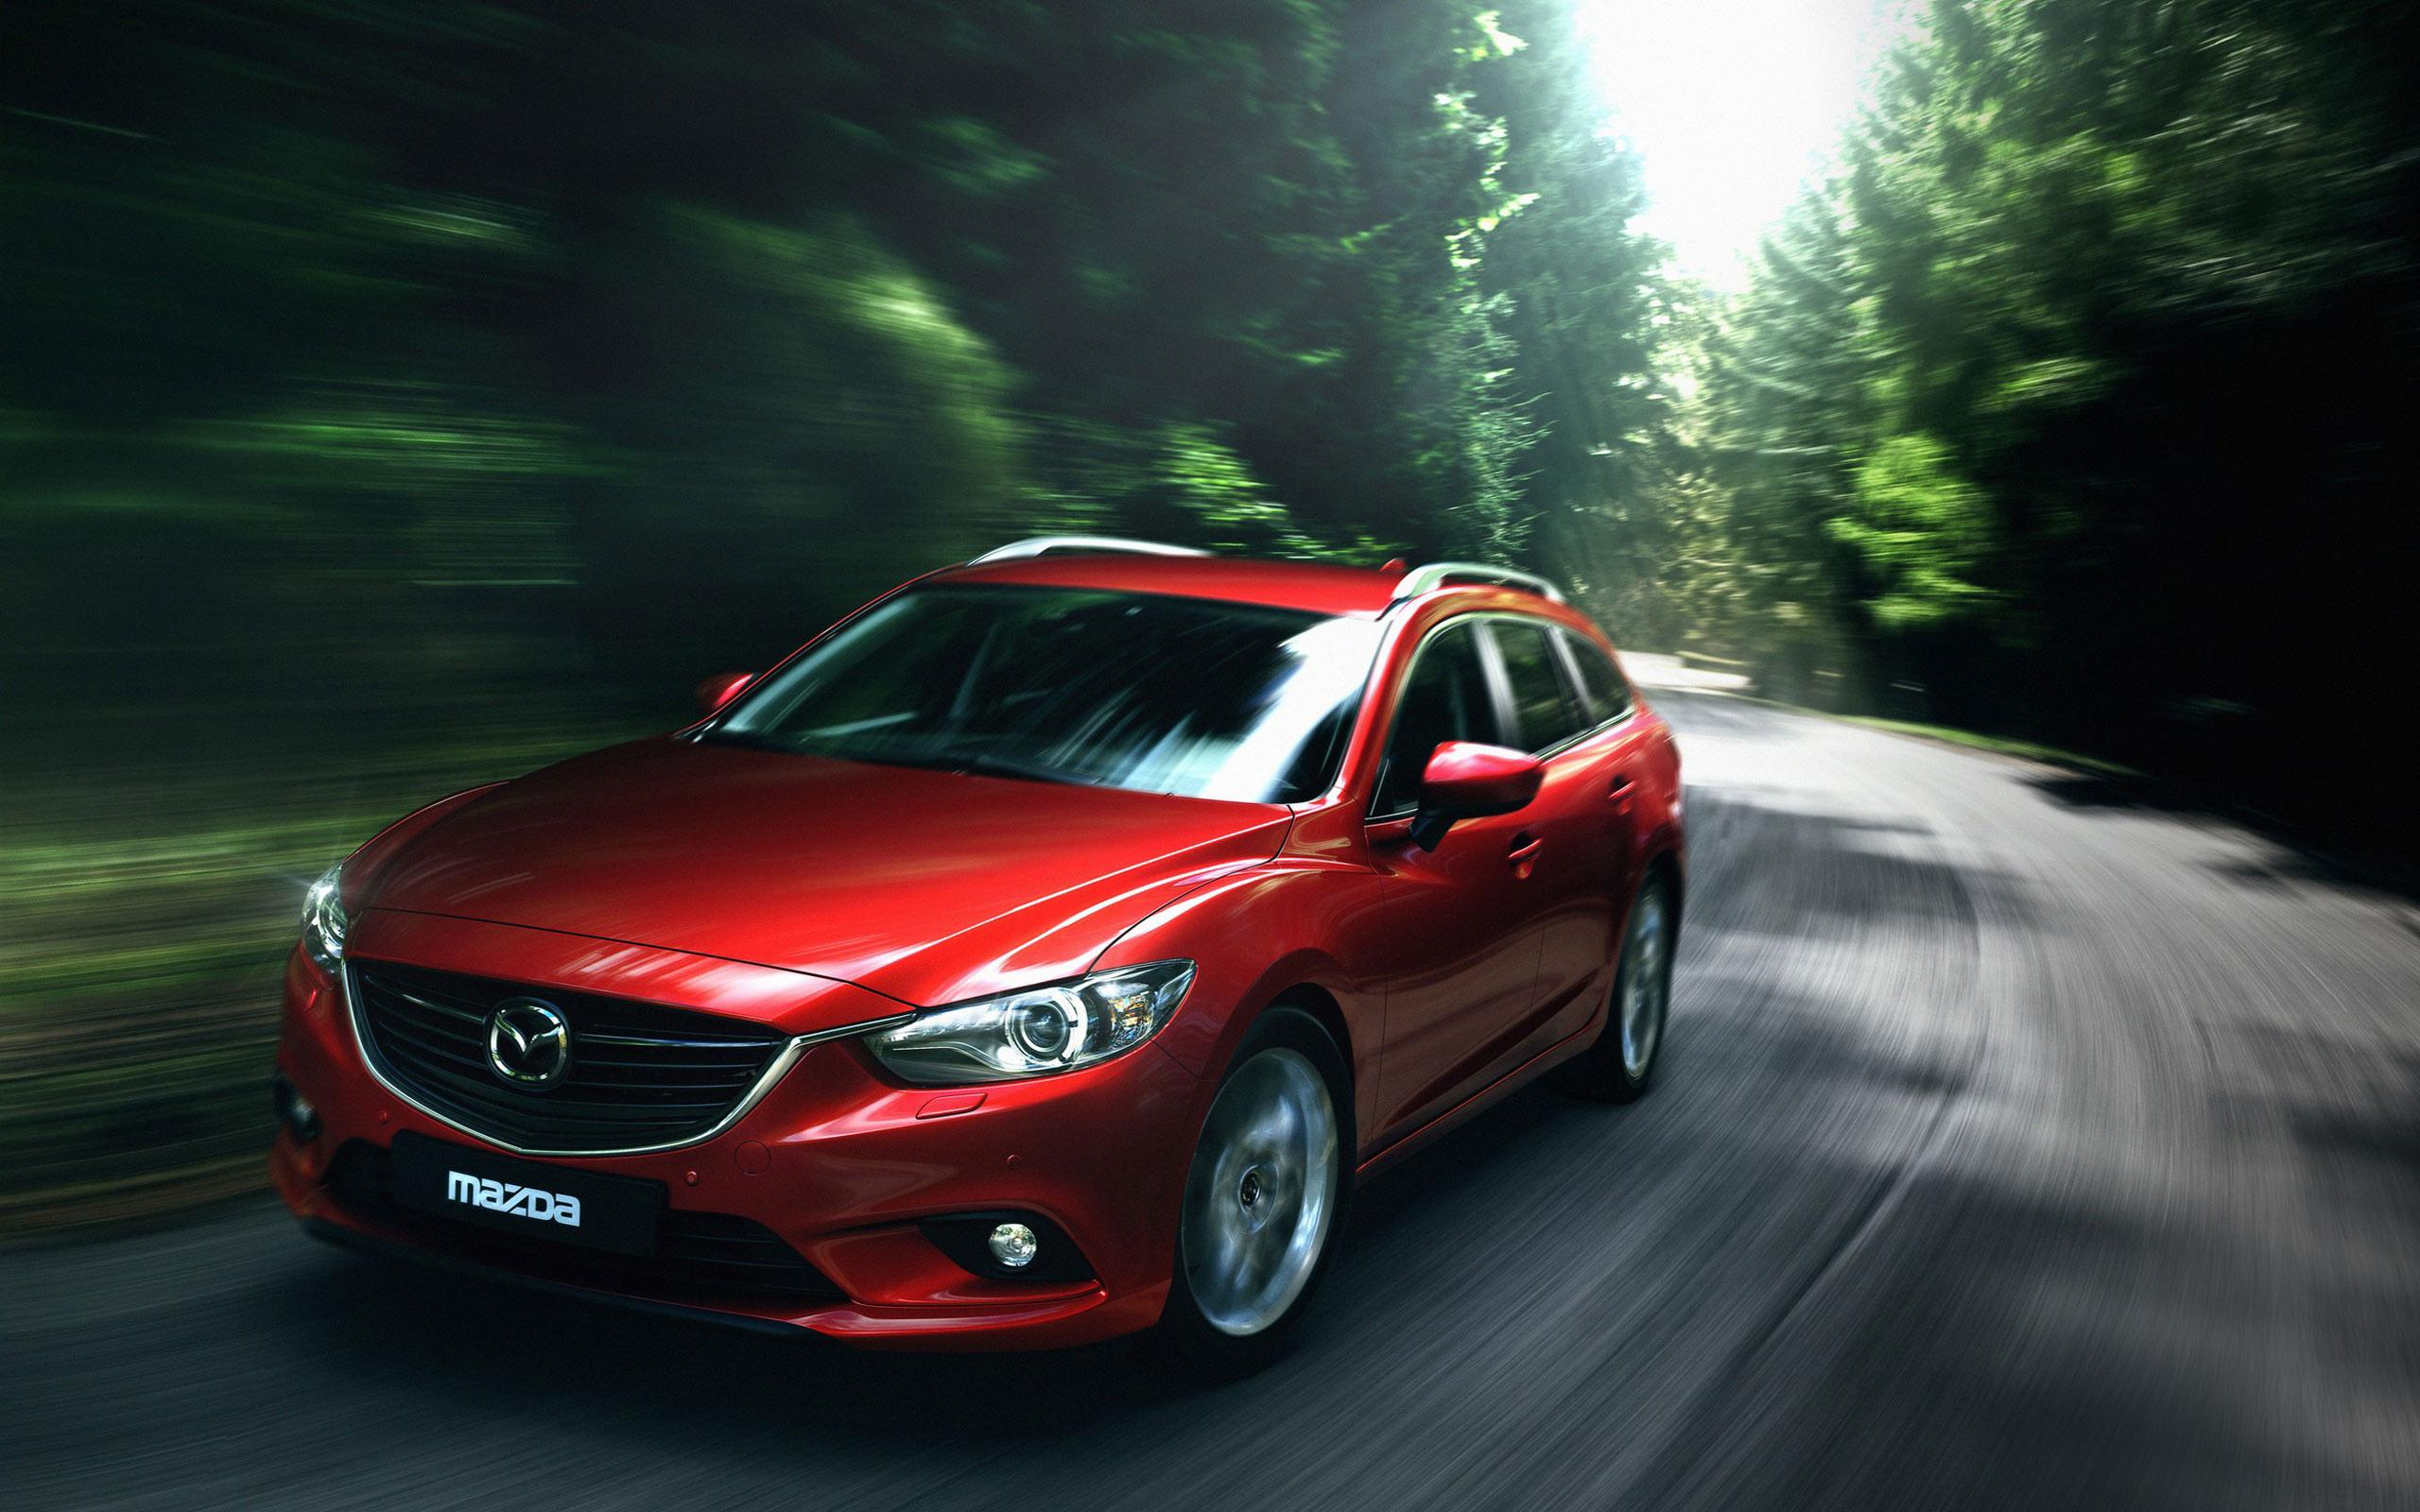 2013 Mazda 6 Wagon Wallpaper | HD Car Wallpapers | ID #3075